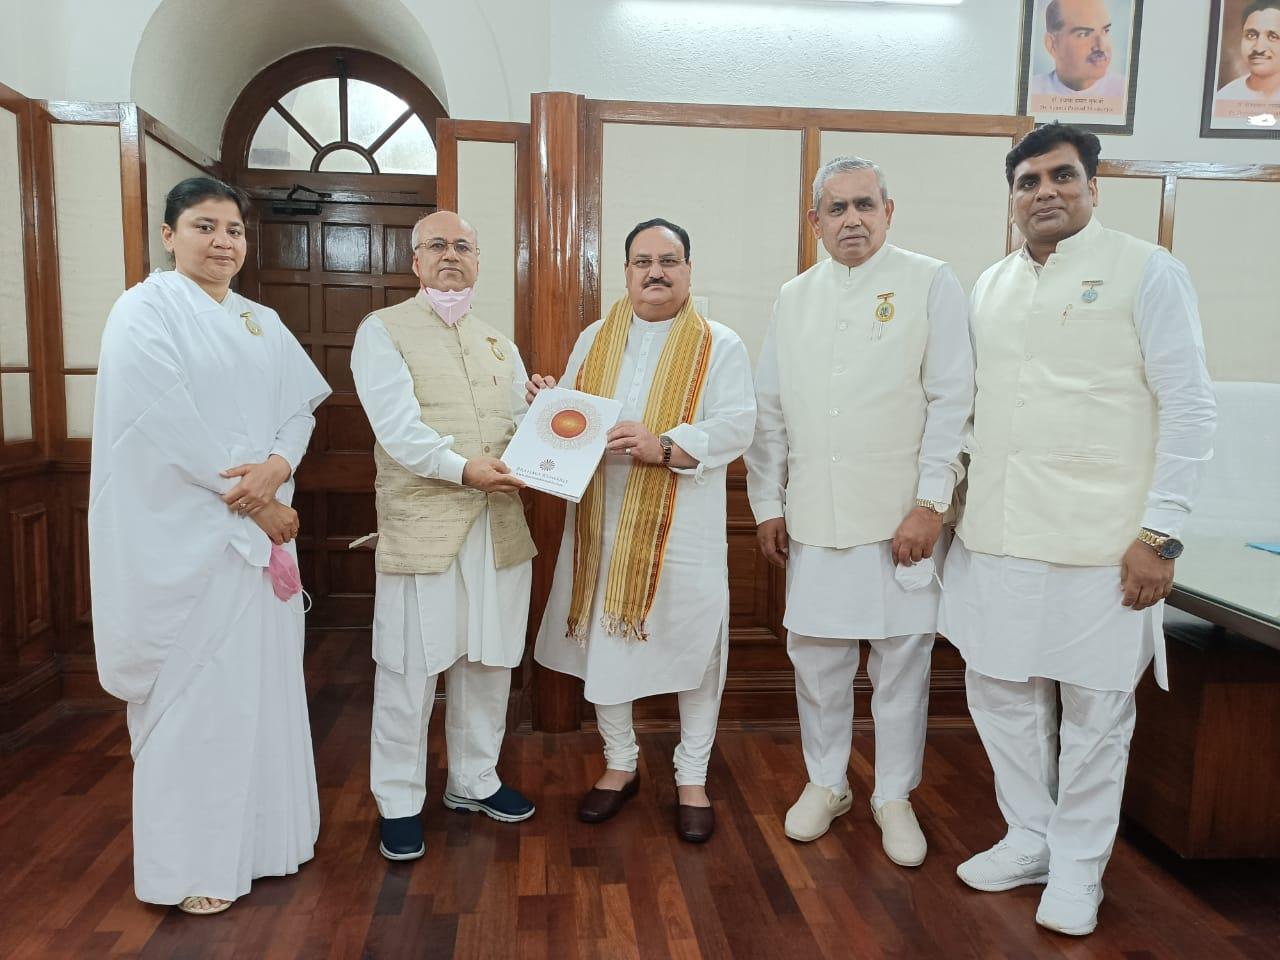 Felicitation of Hon'ble Shri JP Nadda Ji, National President of Bharatiya Janata Party (BJP)